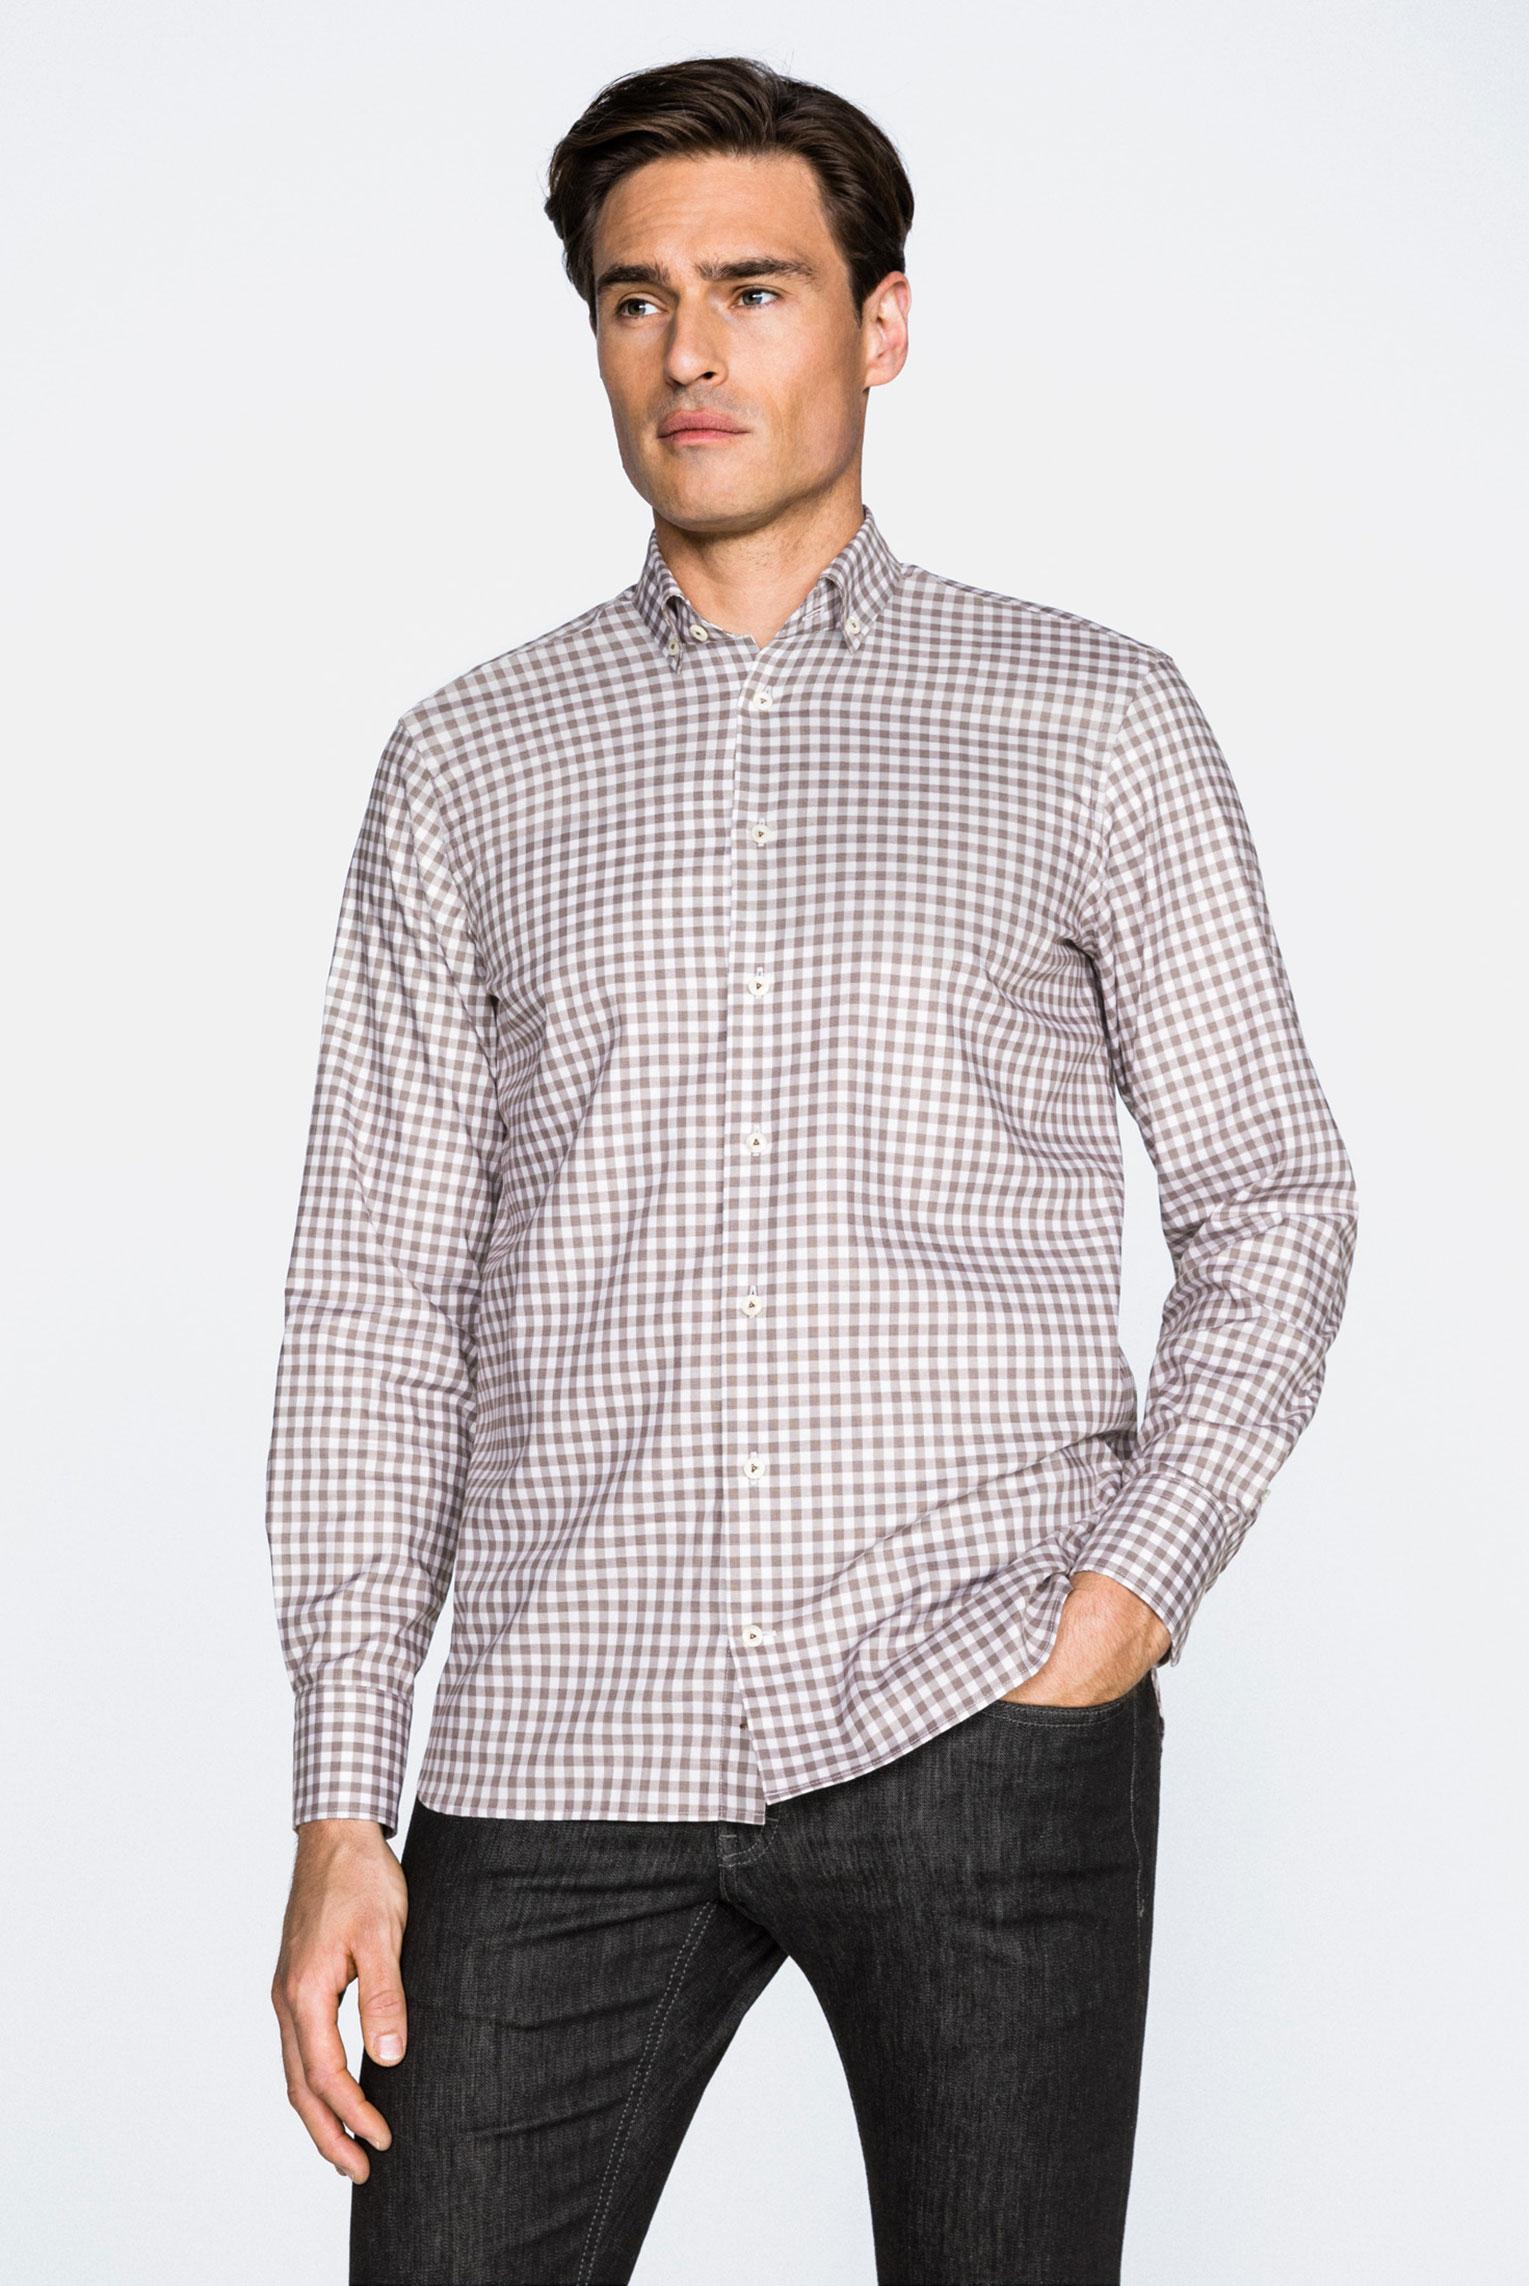 Casual Shirts+ROJAN-TFN+35.3133.BN.161952.160.45